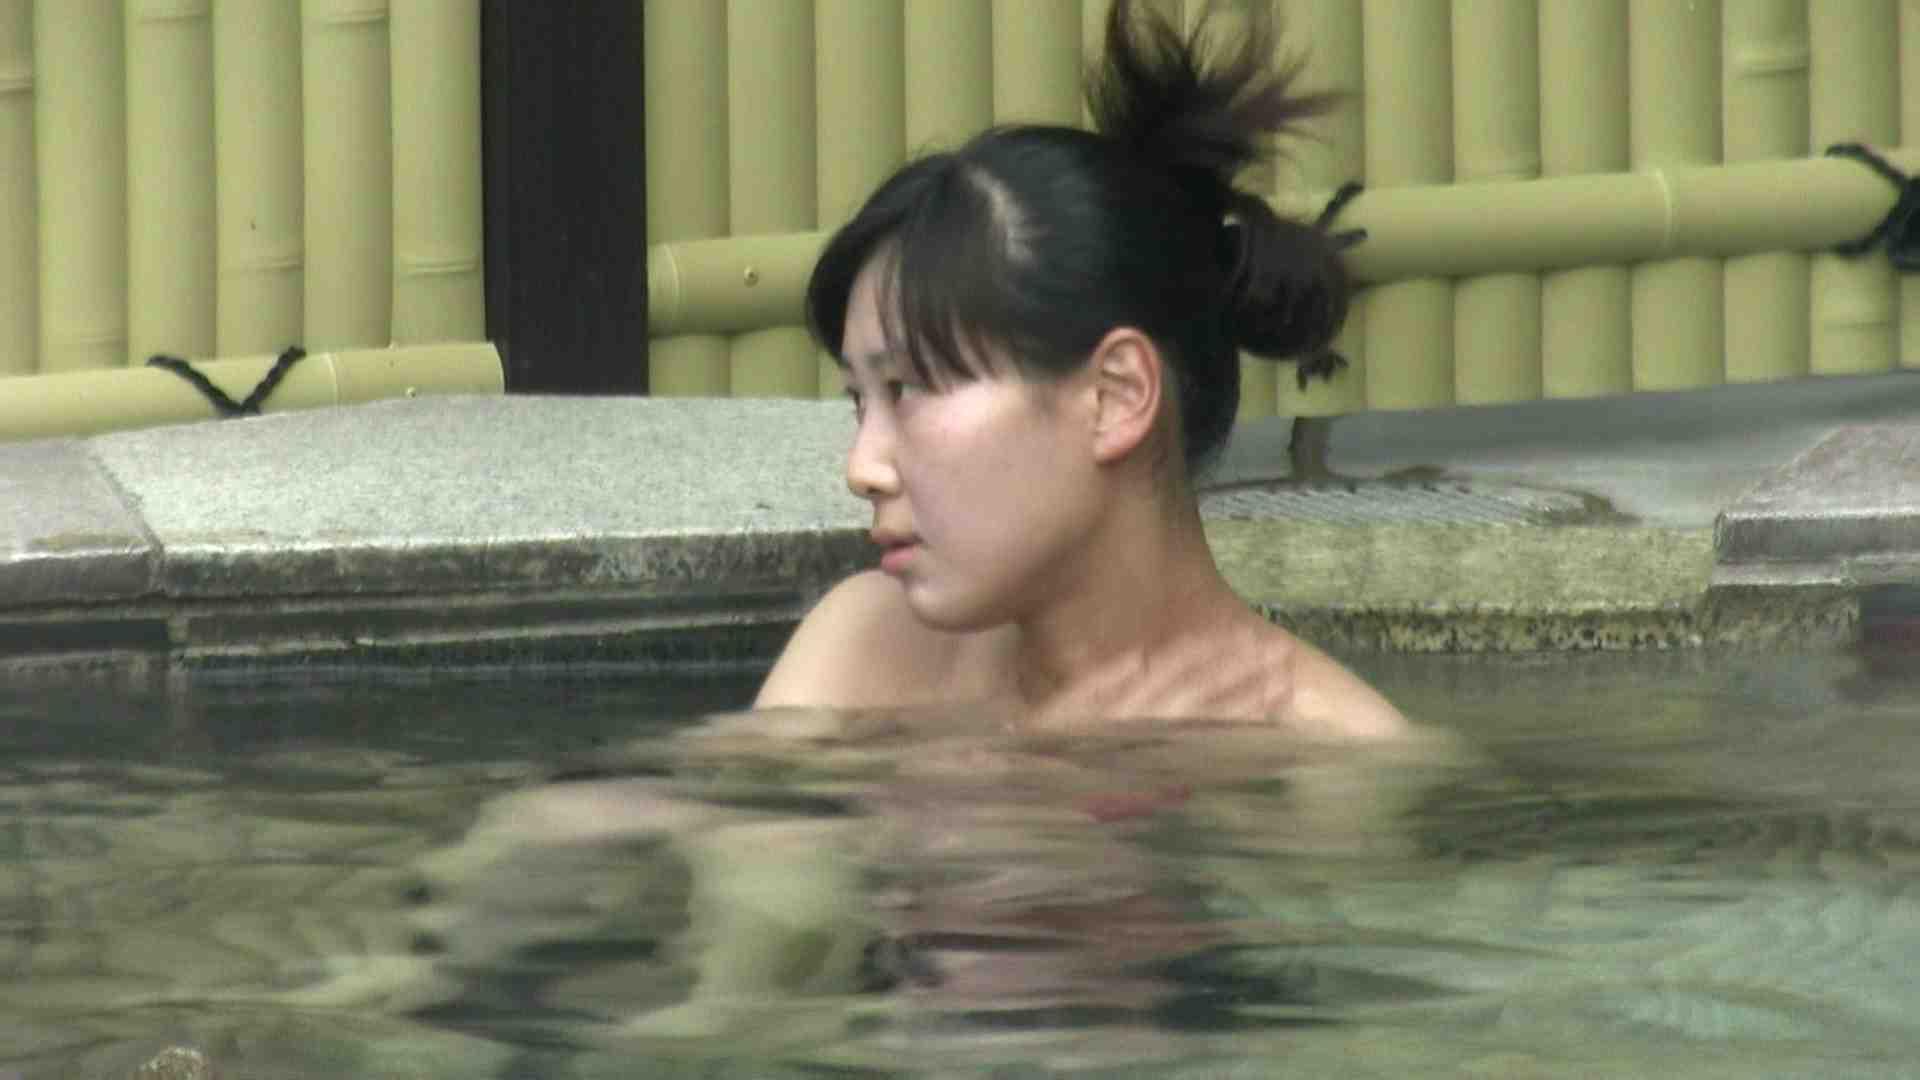 Aquaな露天風呂Vol.665 露天 アダルト動画キャプチャ 85枚 56